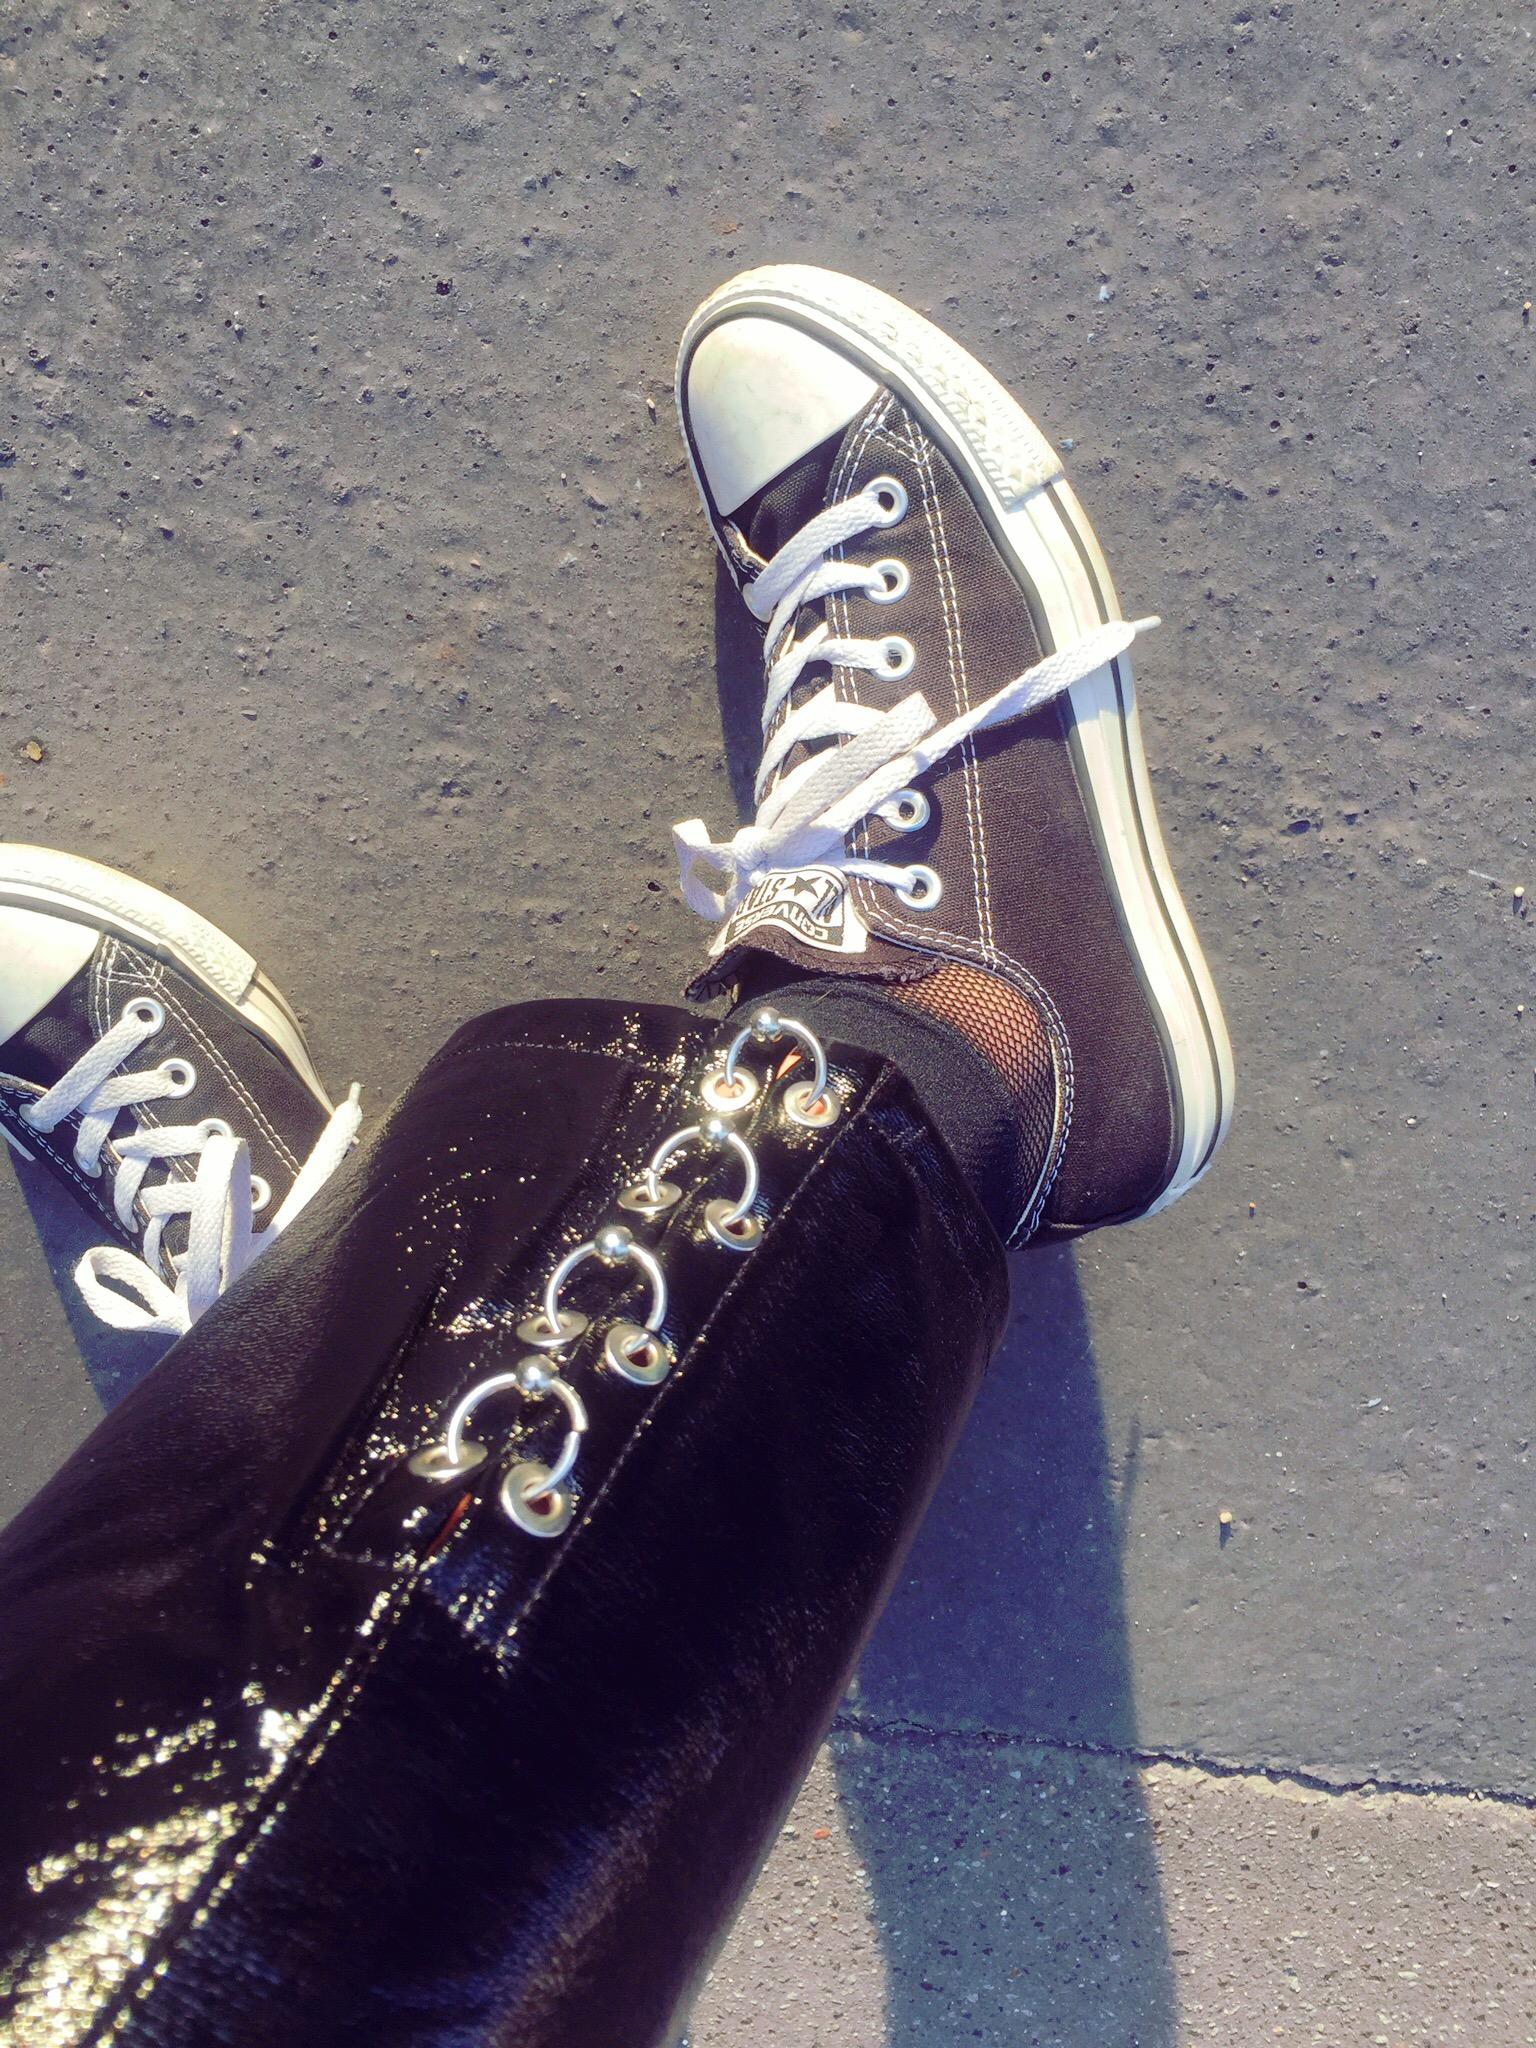 pantalon-vinyle-tendance-style-converse